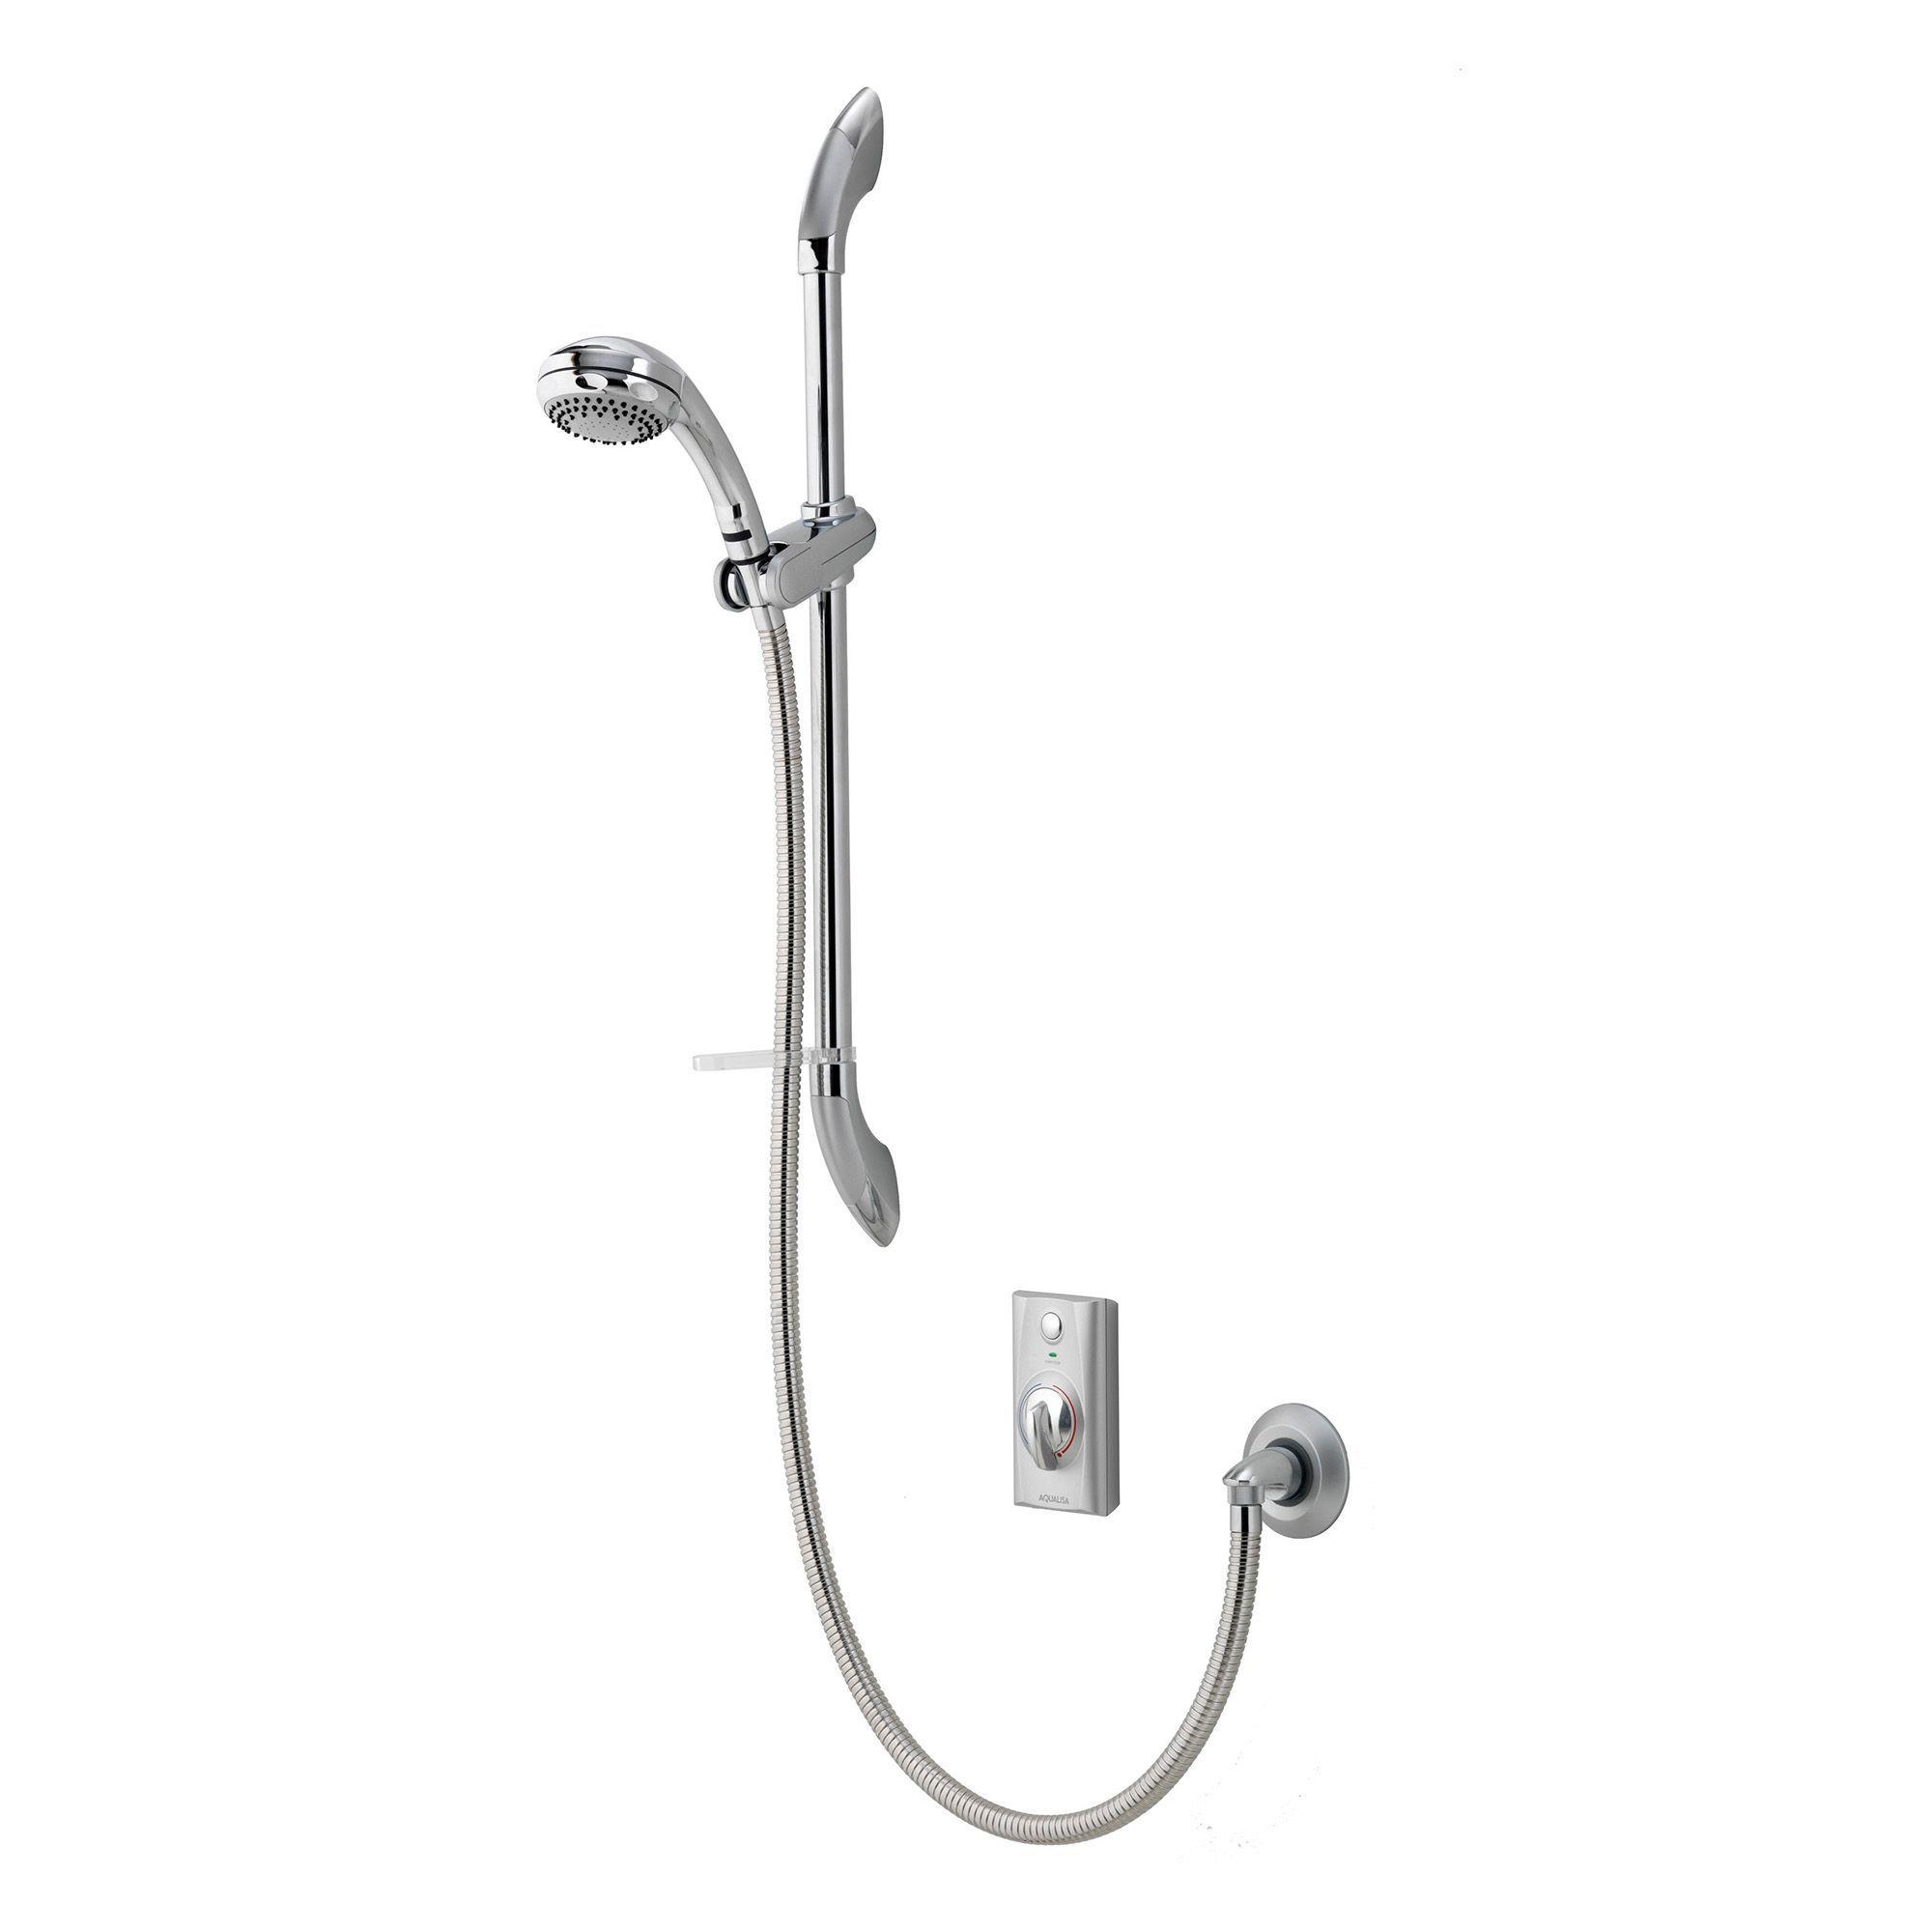 Aqualisa Visage Chrome effect Manual Digital mixer shower